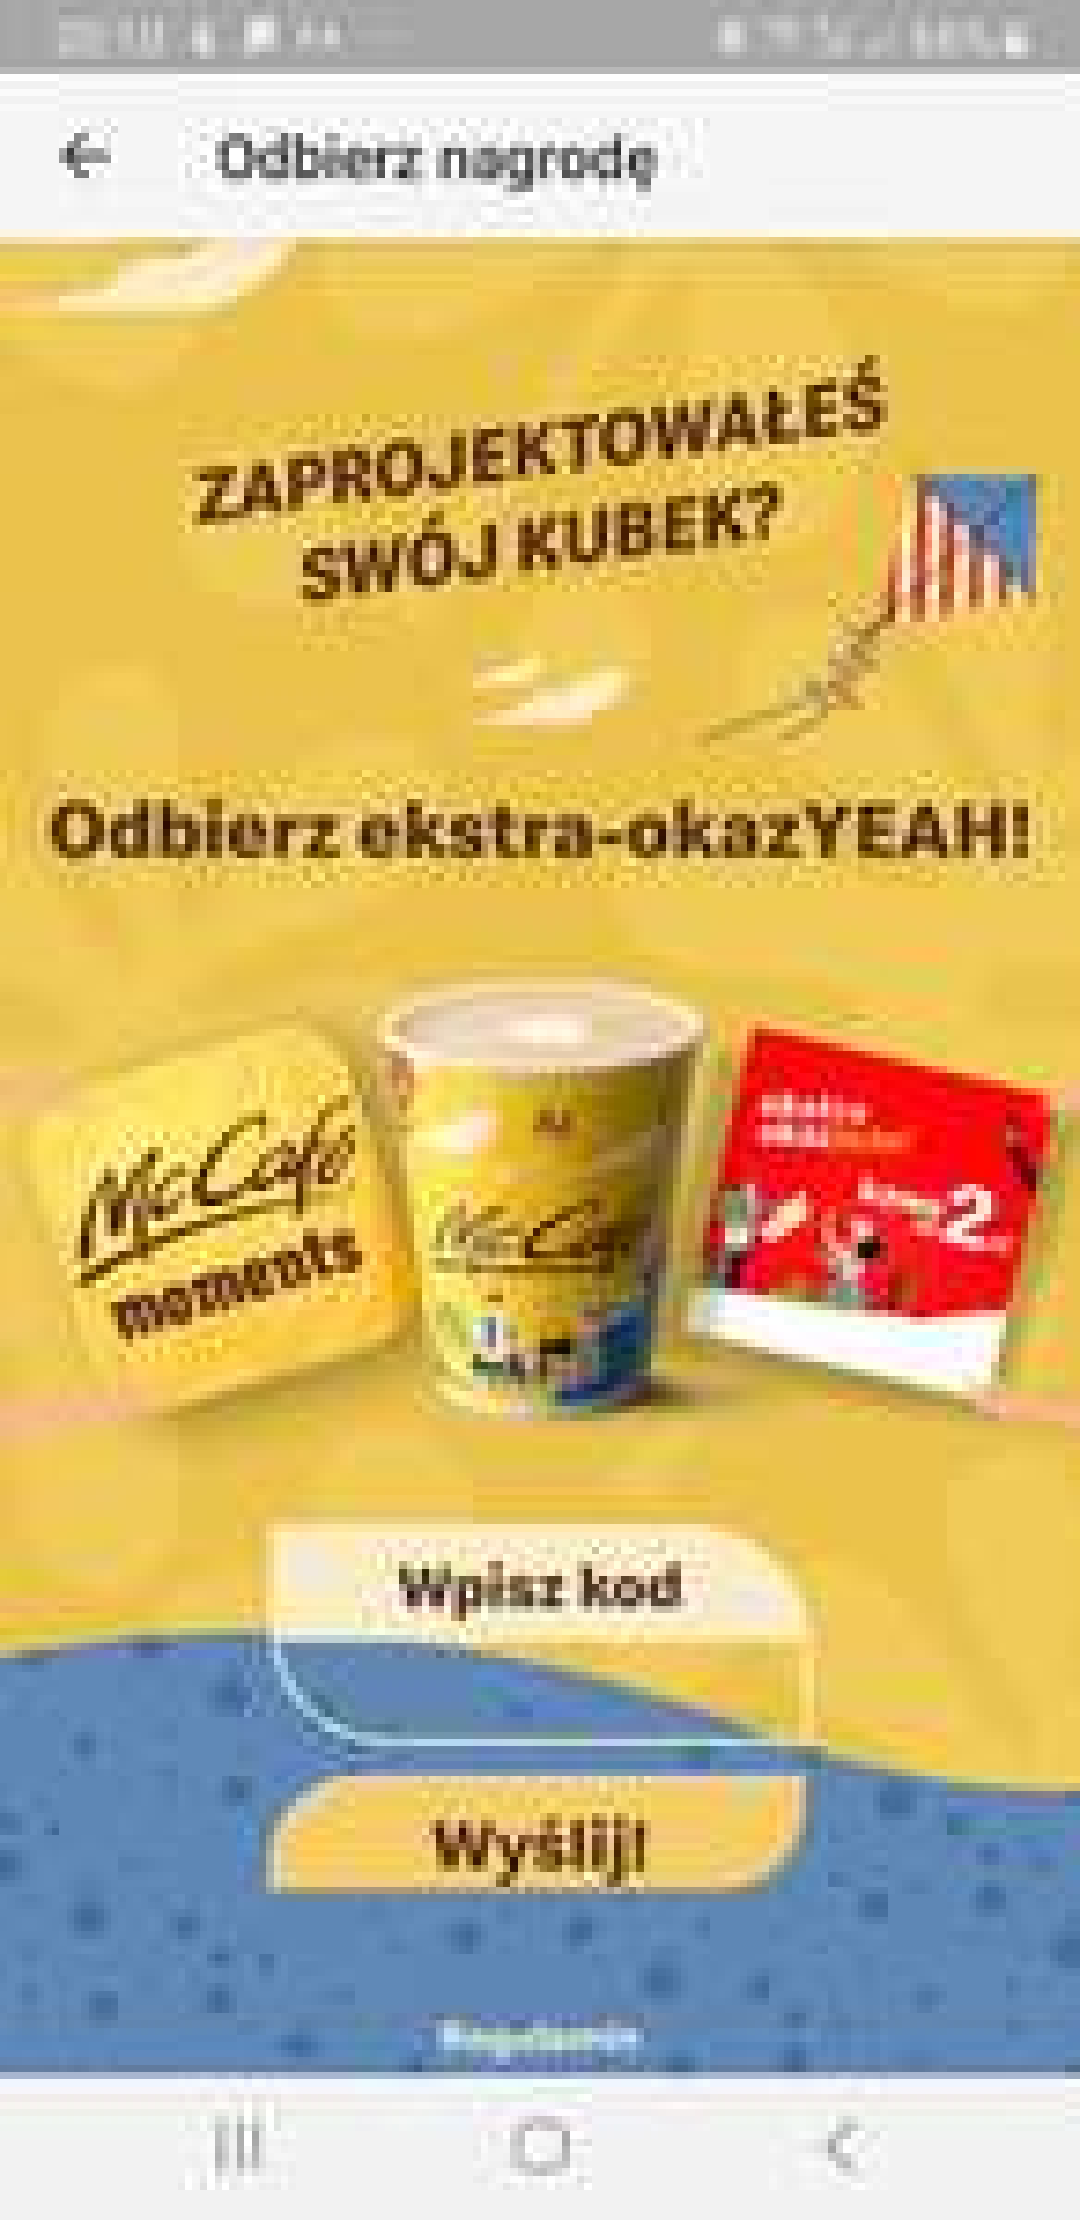 Dowolna kawa za 2 zł w McDonald's